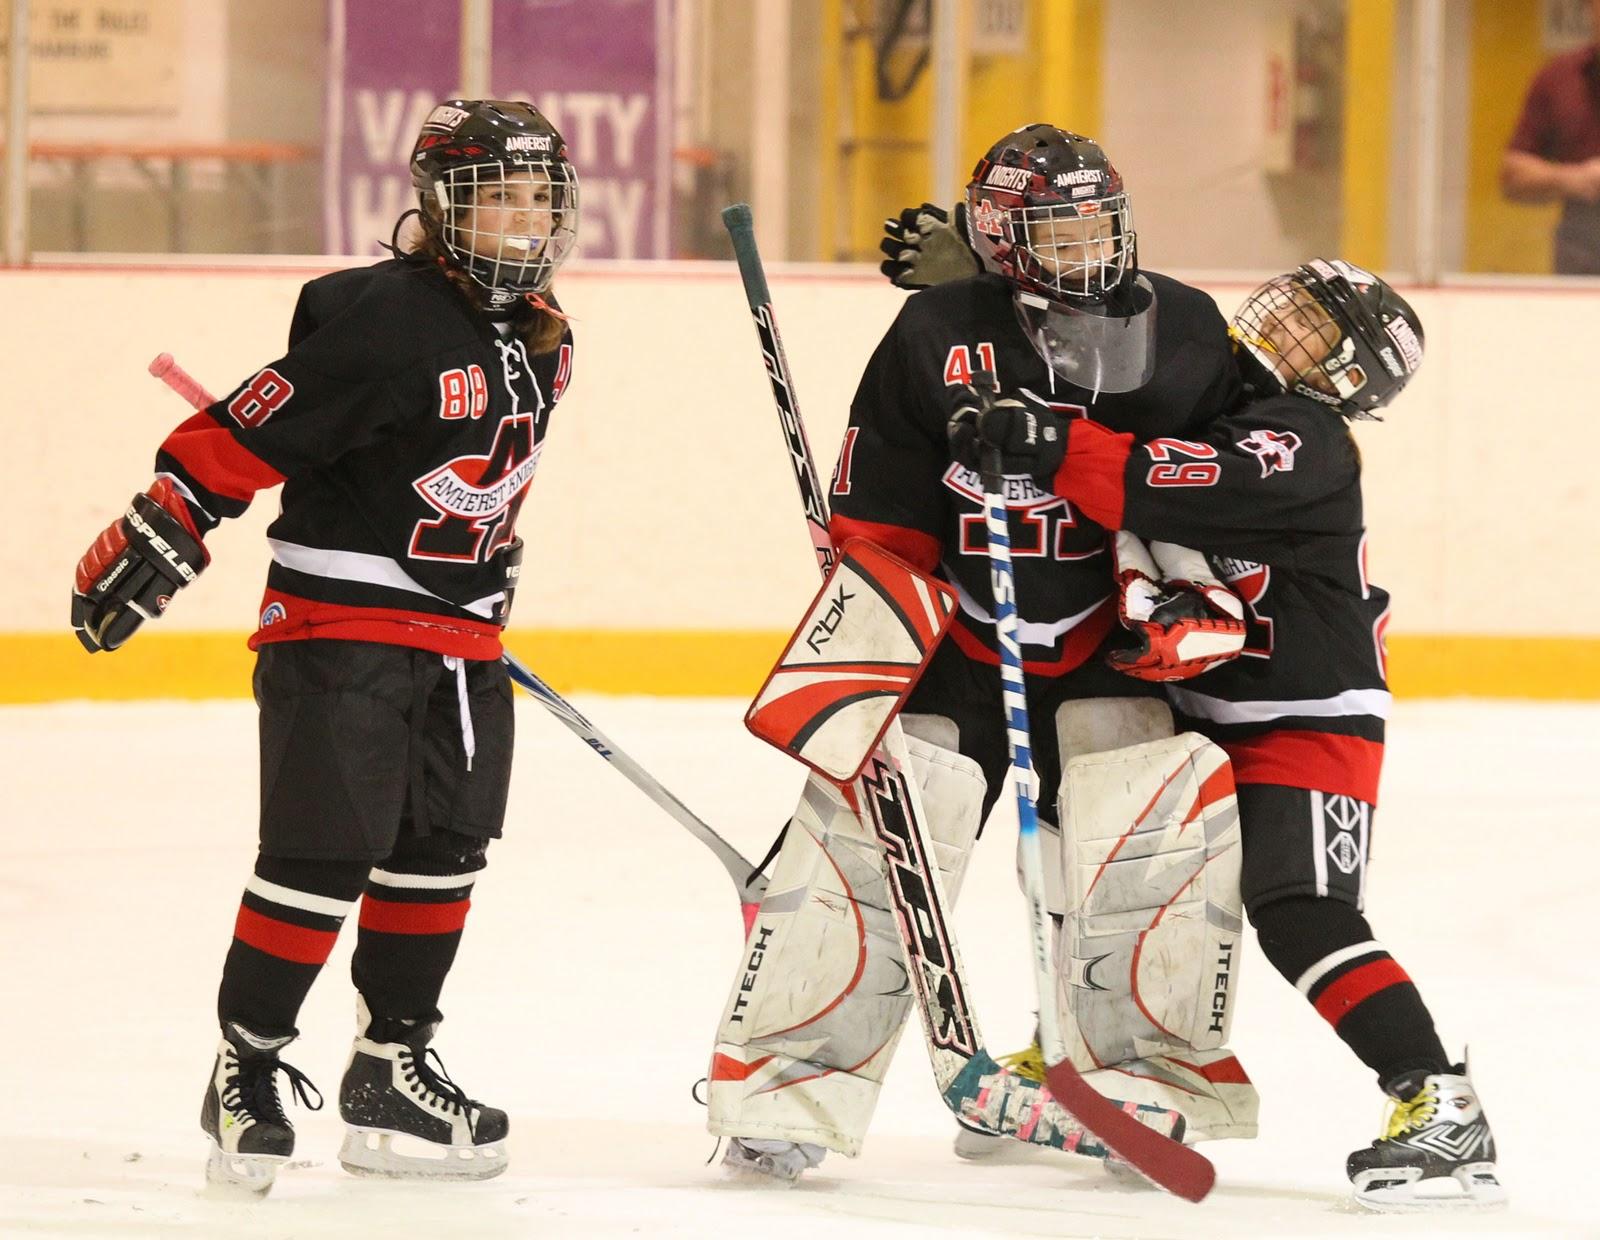 HockeyNYS: NY Girls Hockey Notes for December 12